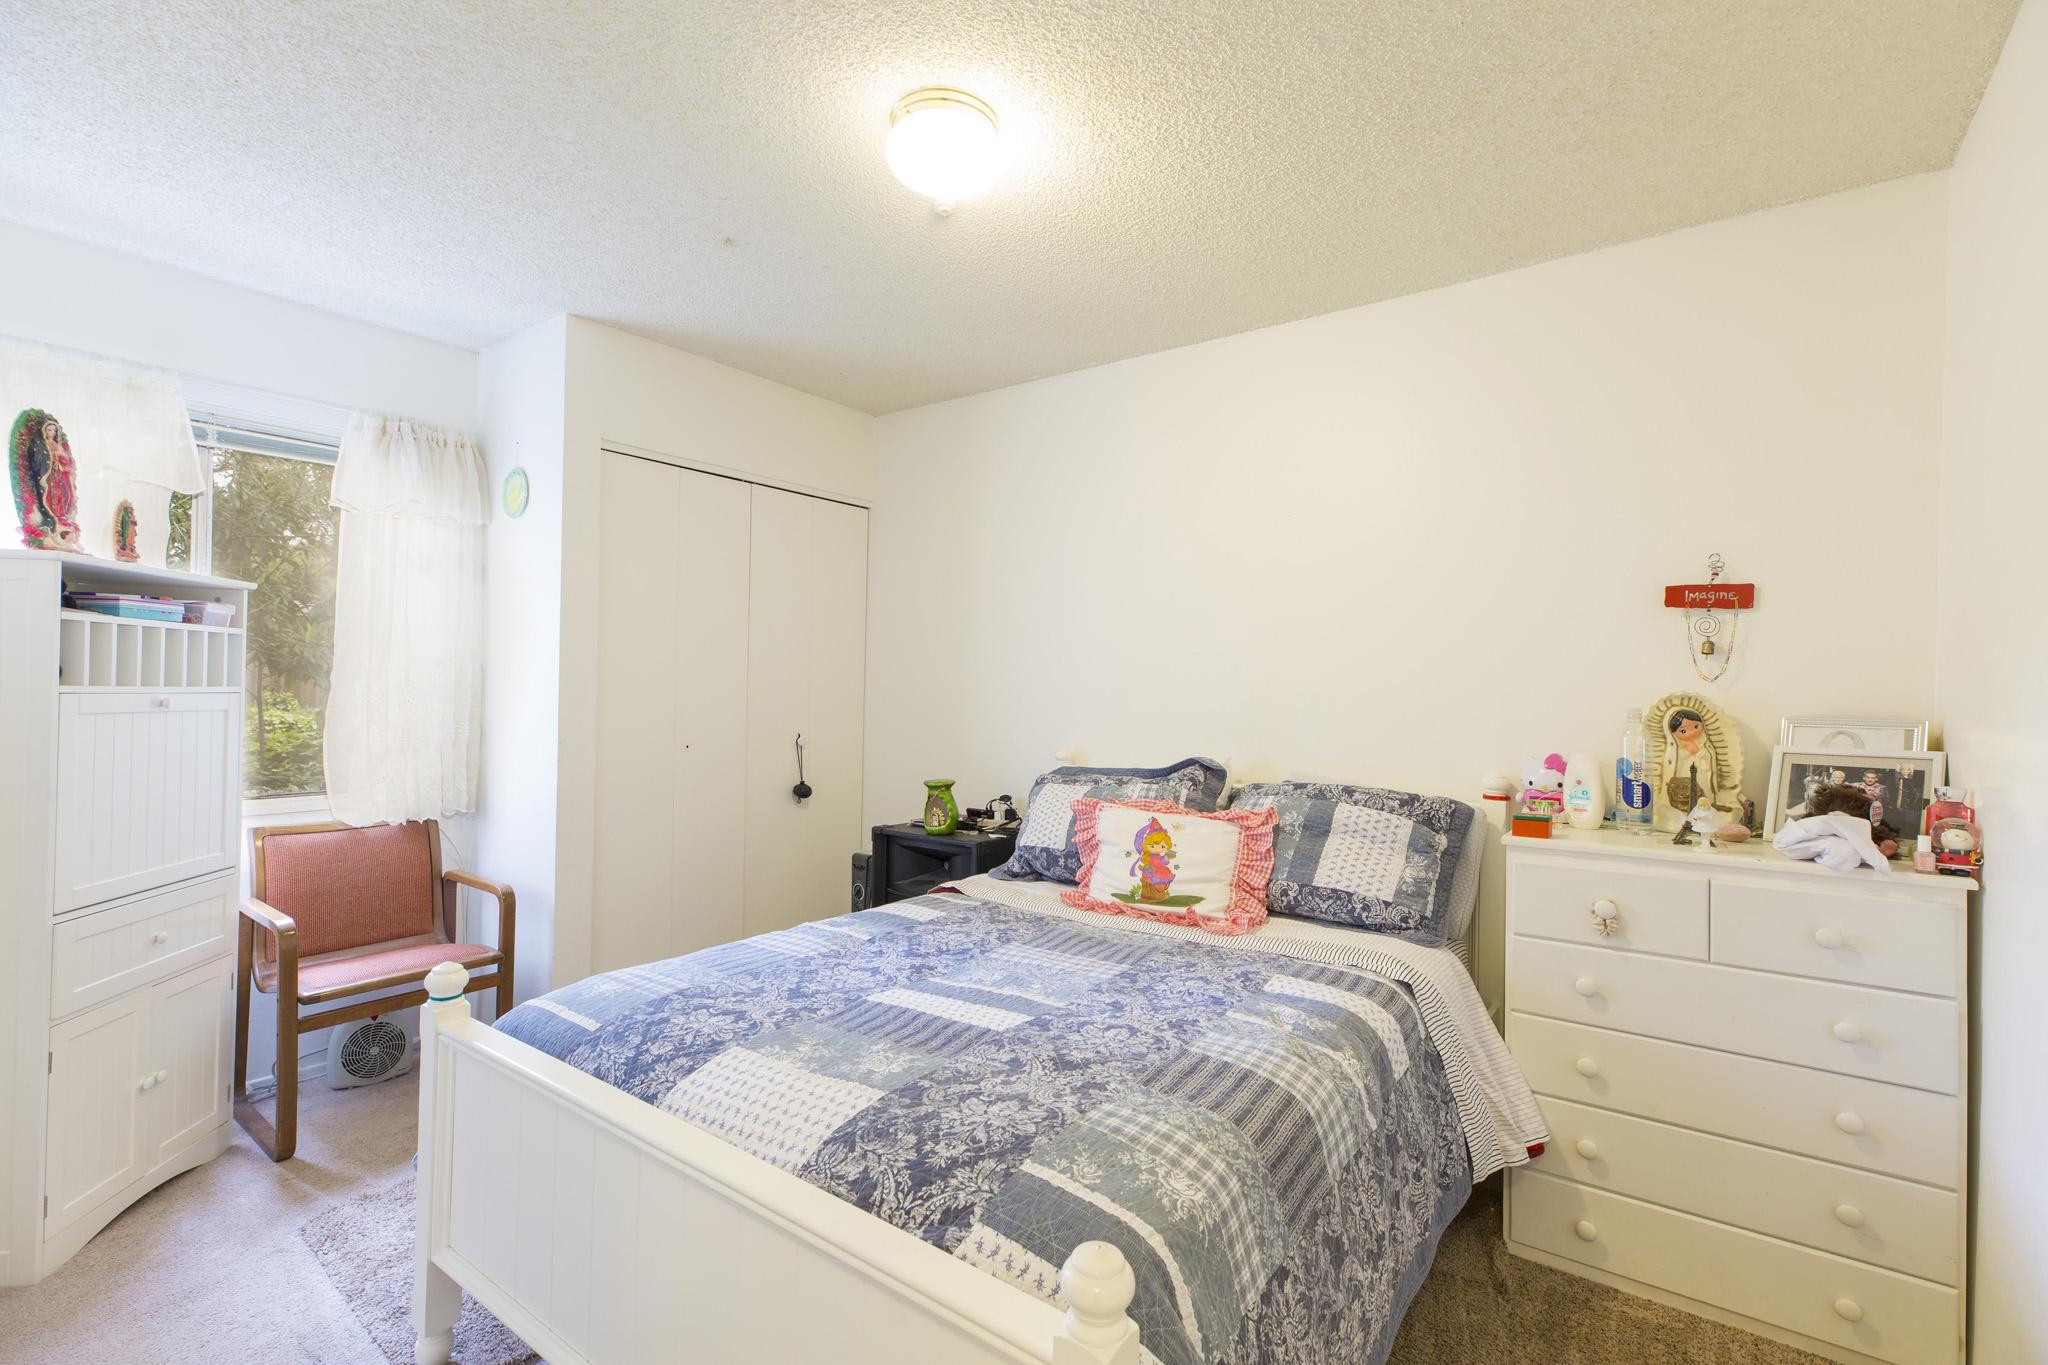 Bedroom2 - Tatiana McWilliams.jpg